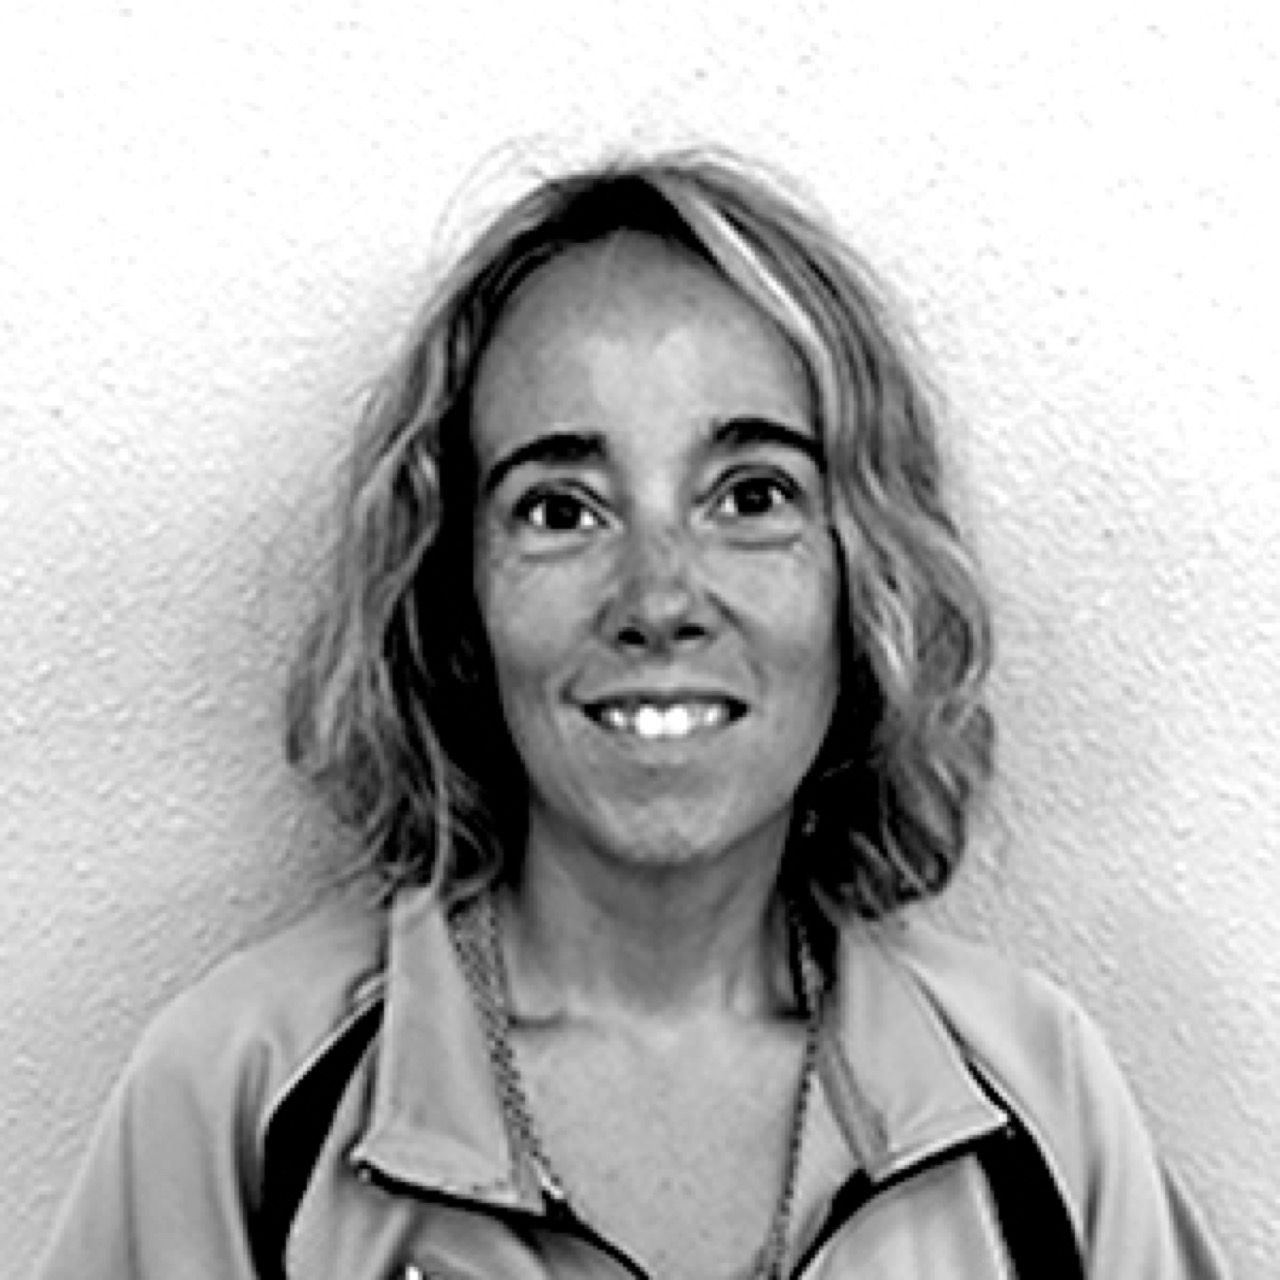 Kayla Bradham